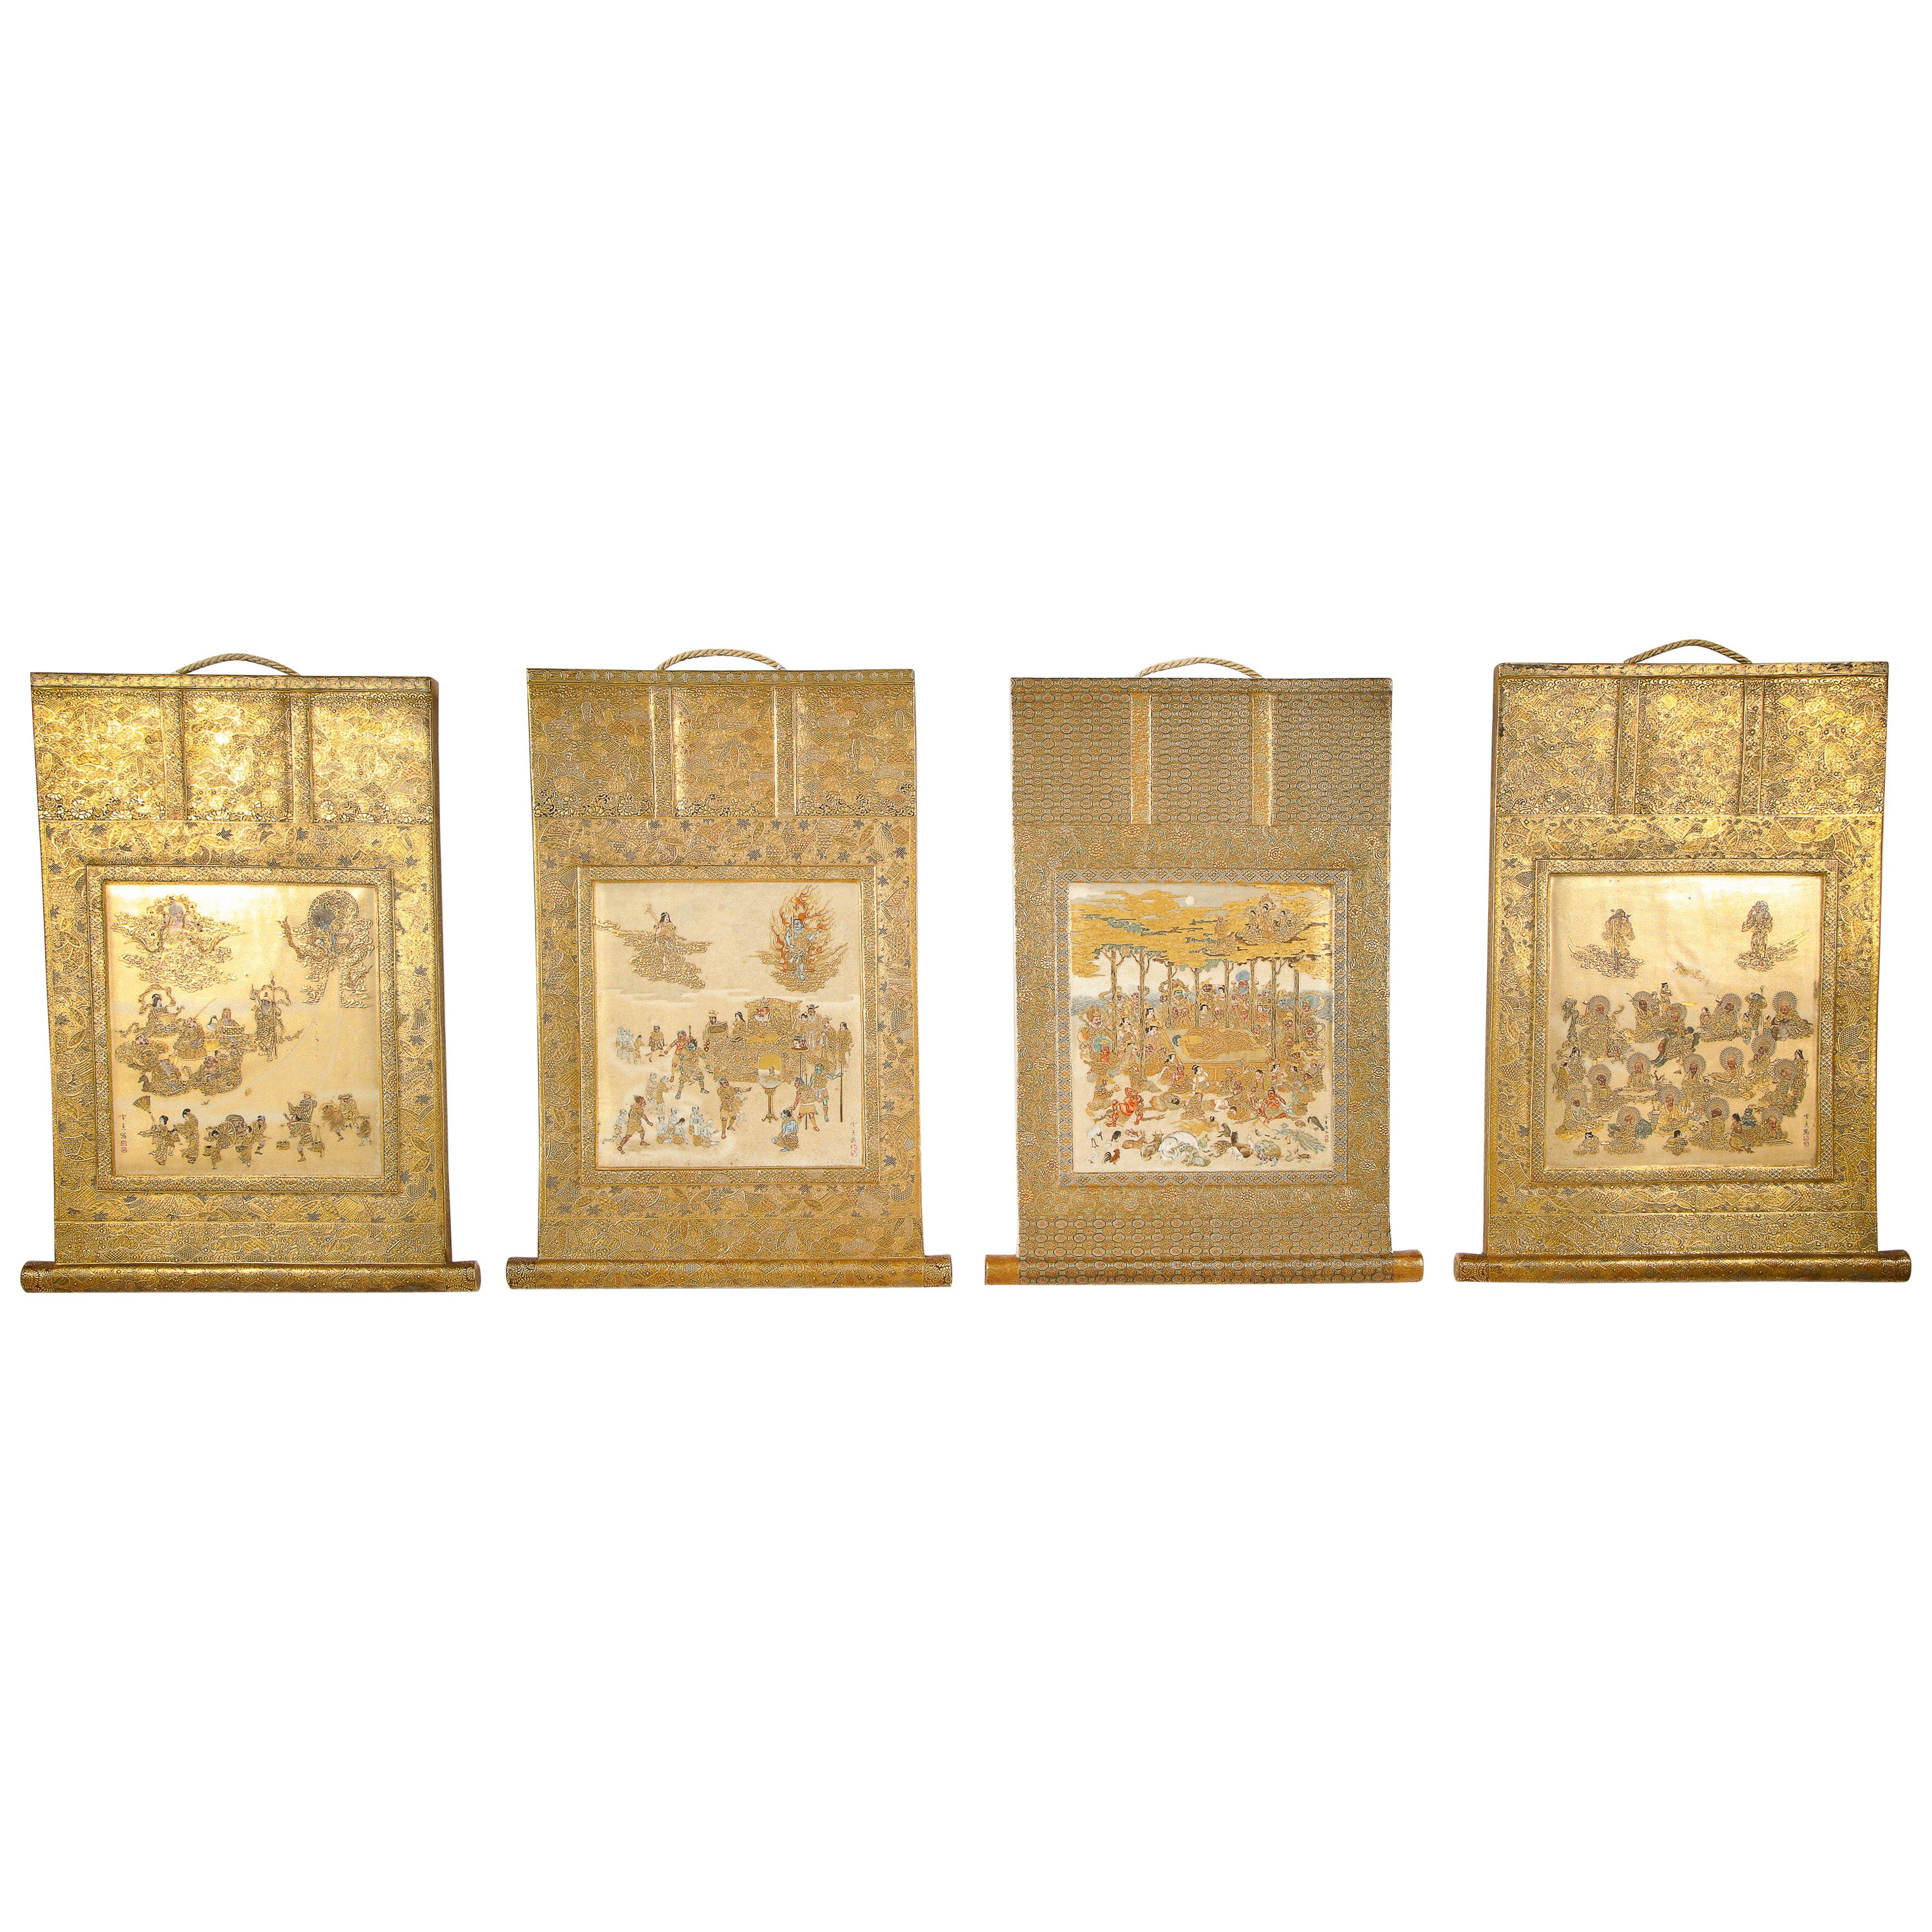 Rare Set of 4 Japanese Satsuma Plaques by Hododa, Meiji Period